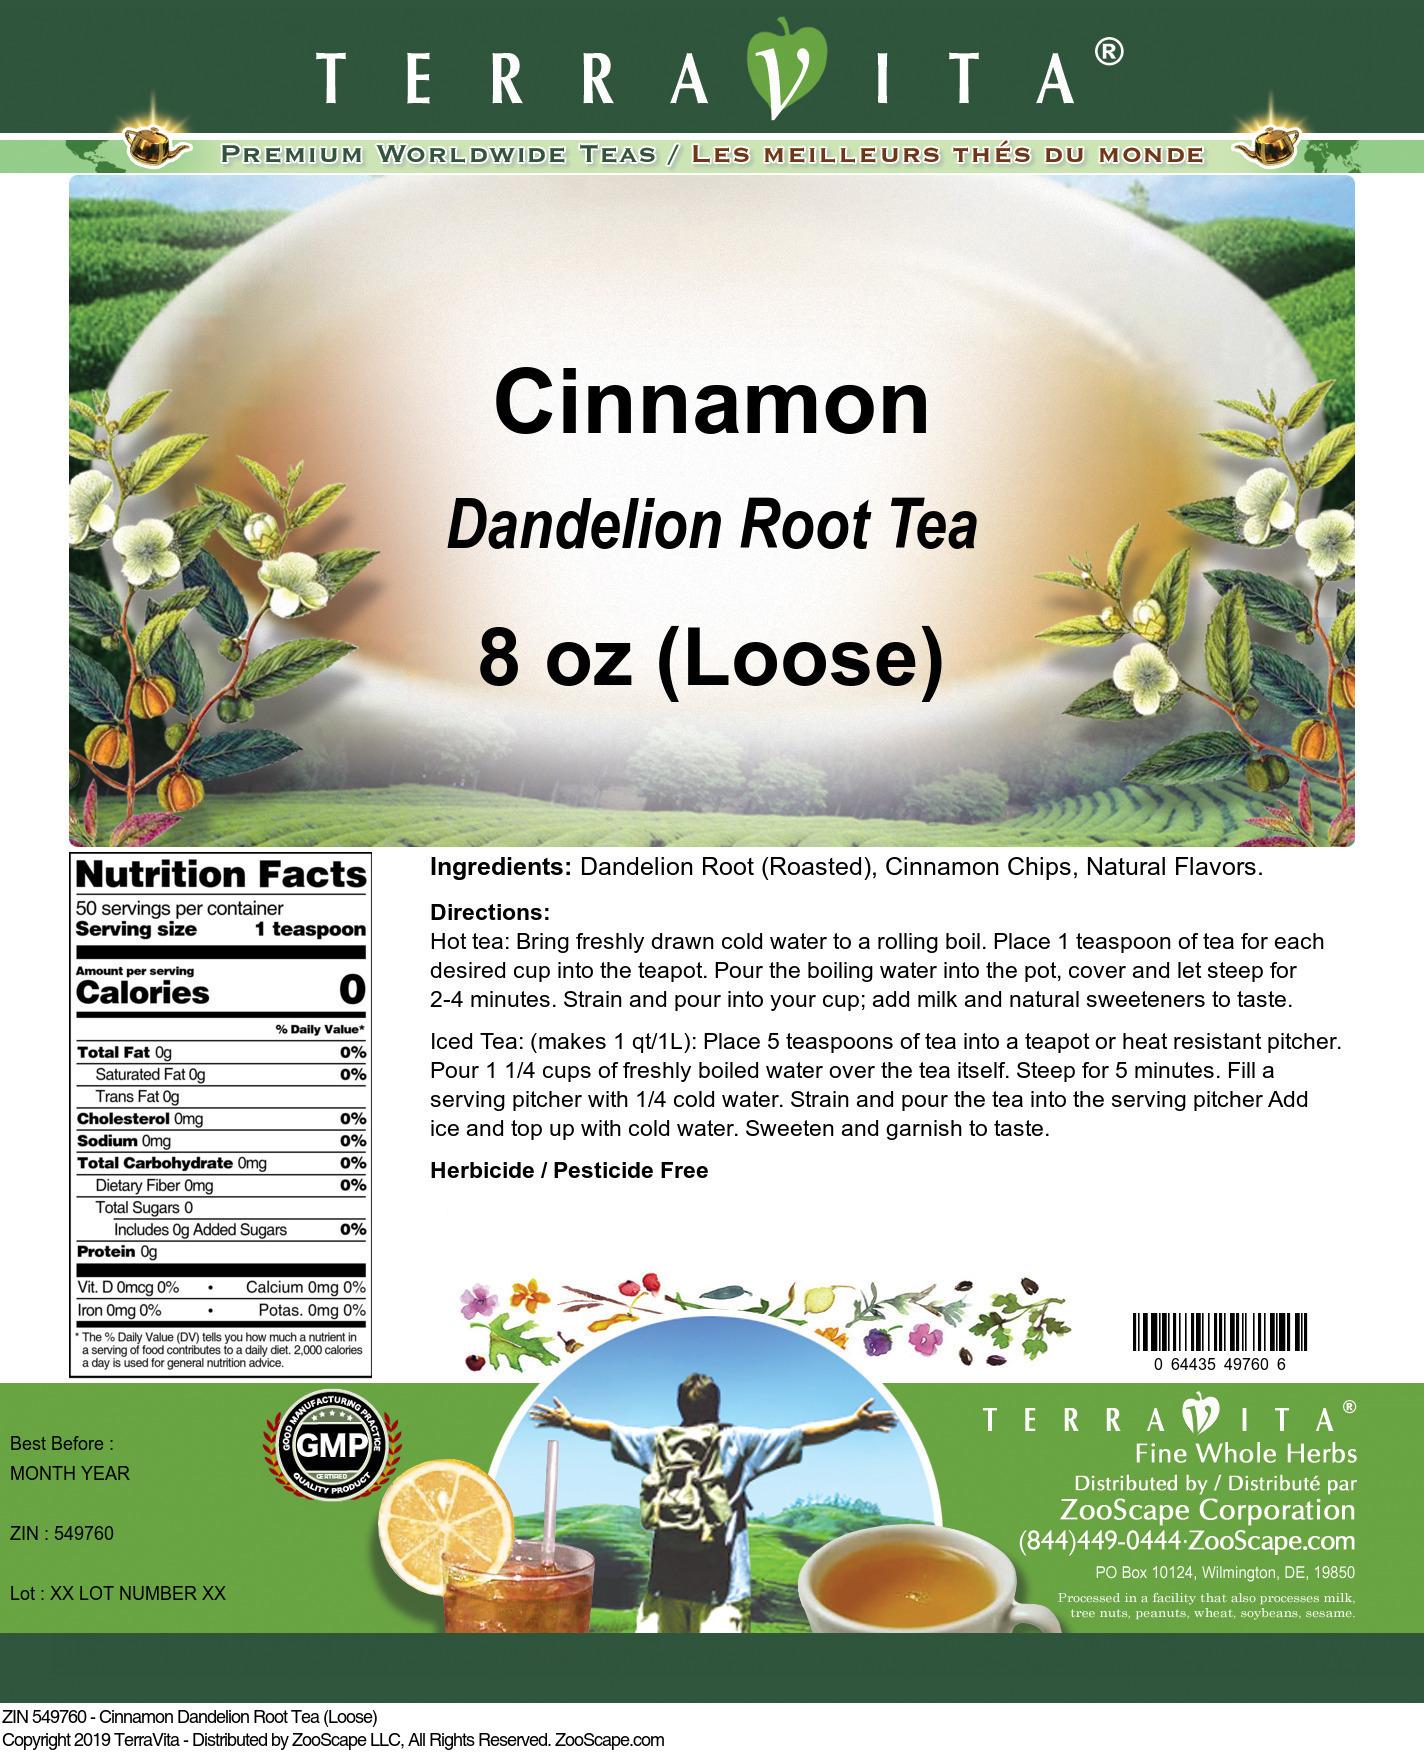 Cinnamon Dandelion Root